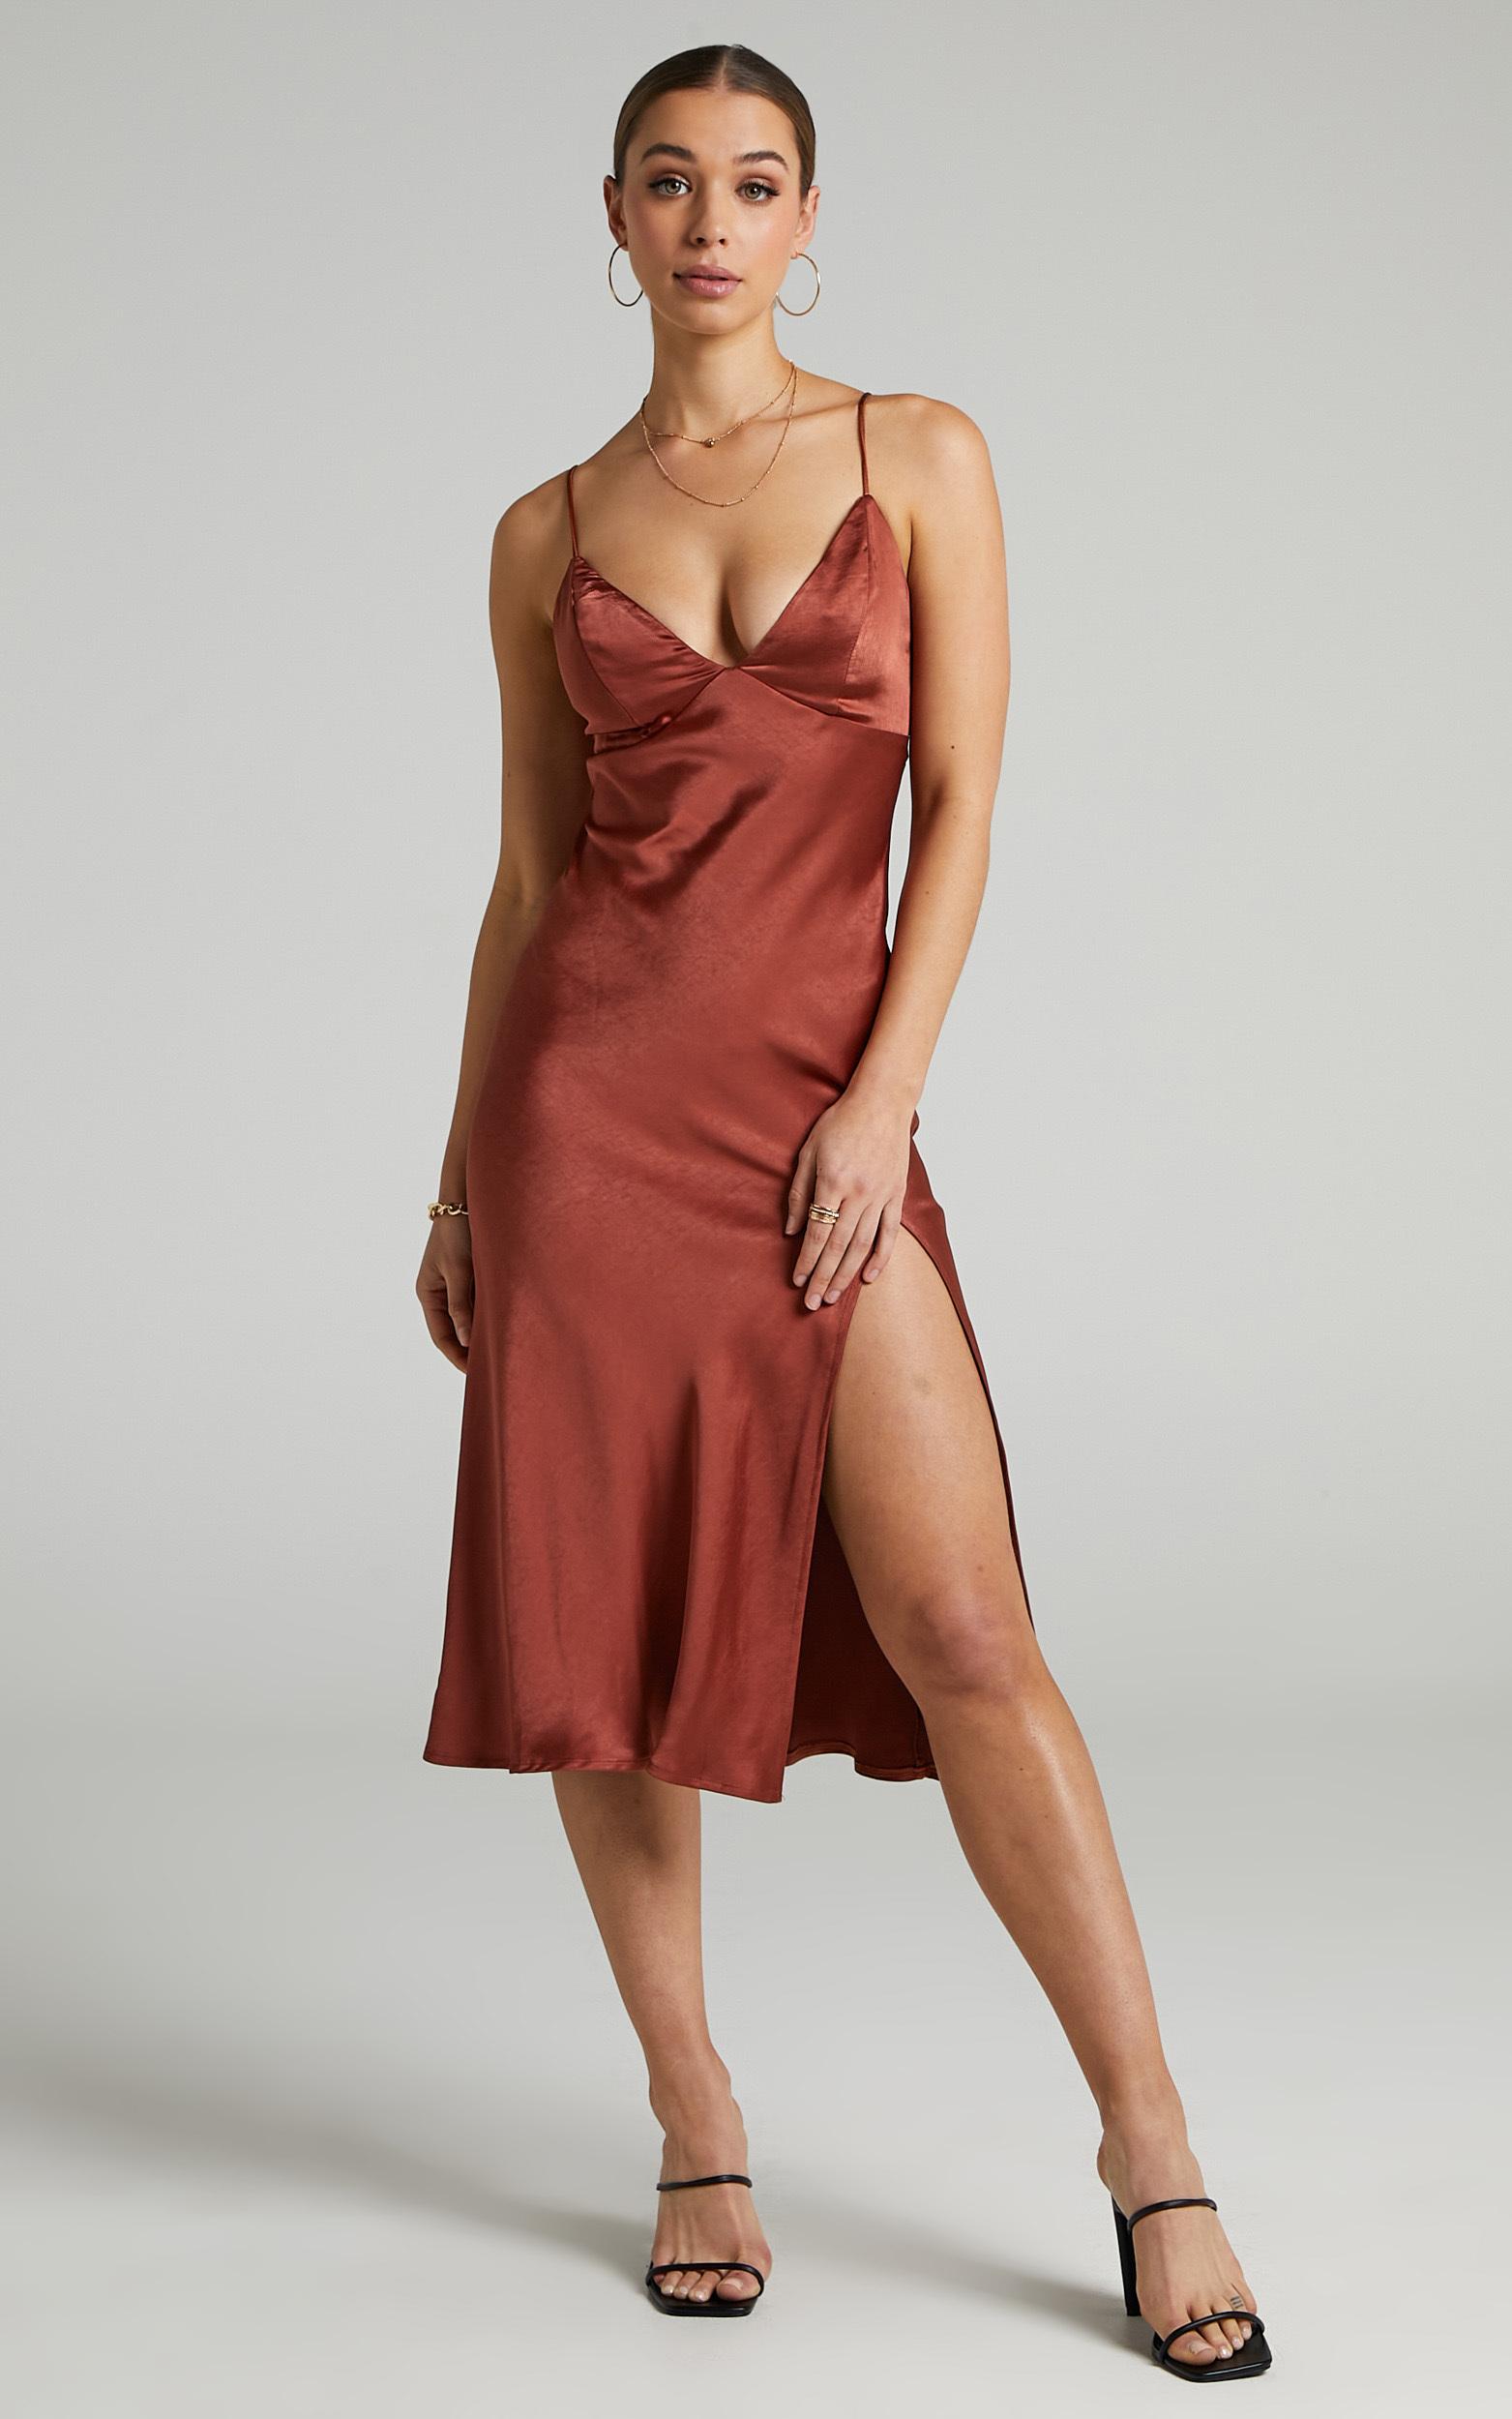 Joahanna Satin Slip Dress in Rust - 06, BRN1, hi-res image number null